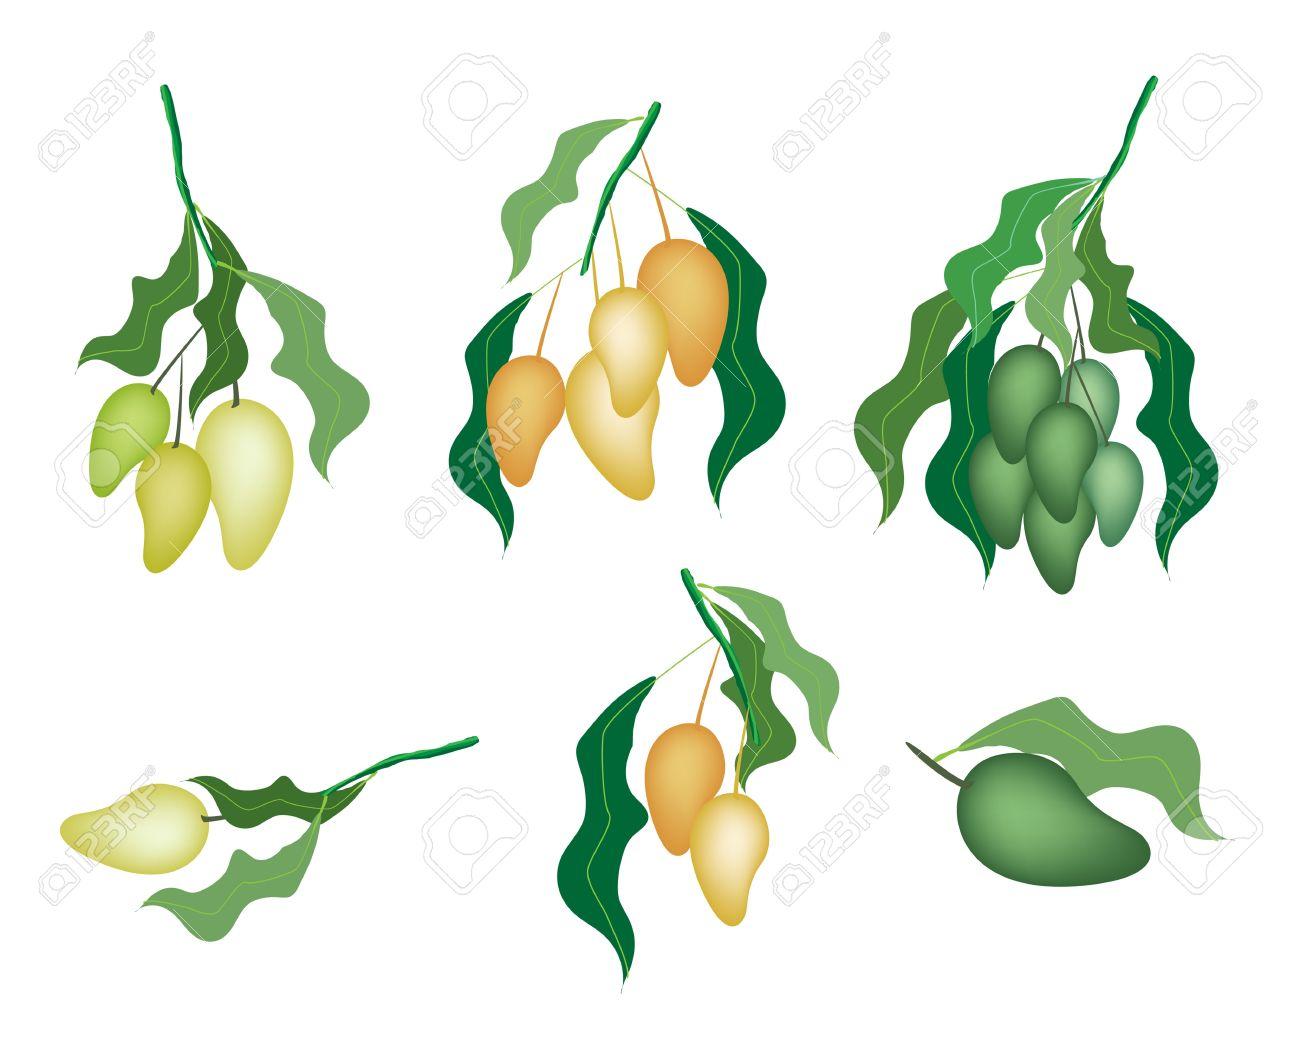 An Illustration Collection Of Various Style Fresh Ripe Mango And Unripe  Mango With Green Leaves Hanging 20160323cuttingmangovickywasik5g